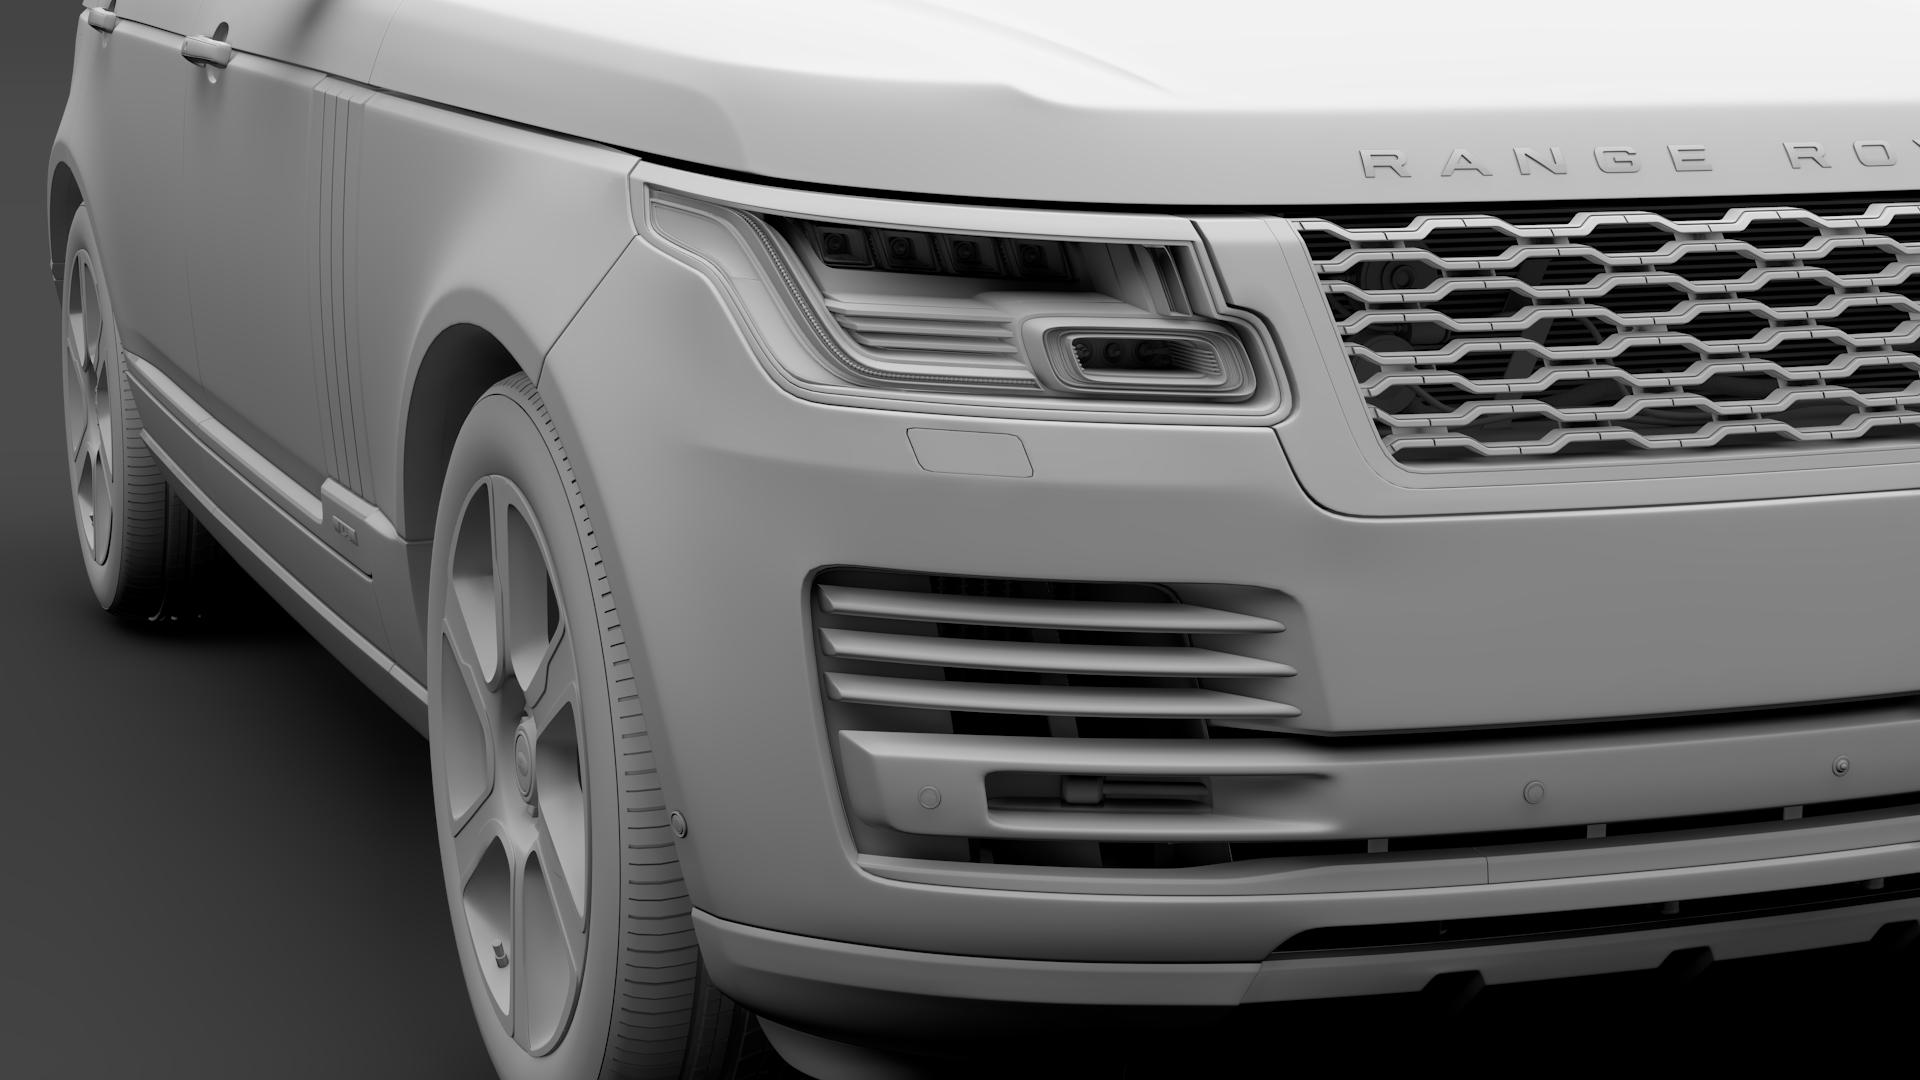 range rover hybrid lwb l405 2018 3d model max fbx c4d lwo ma mb hrc xsi obj 277427